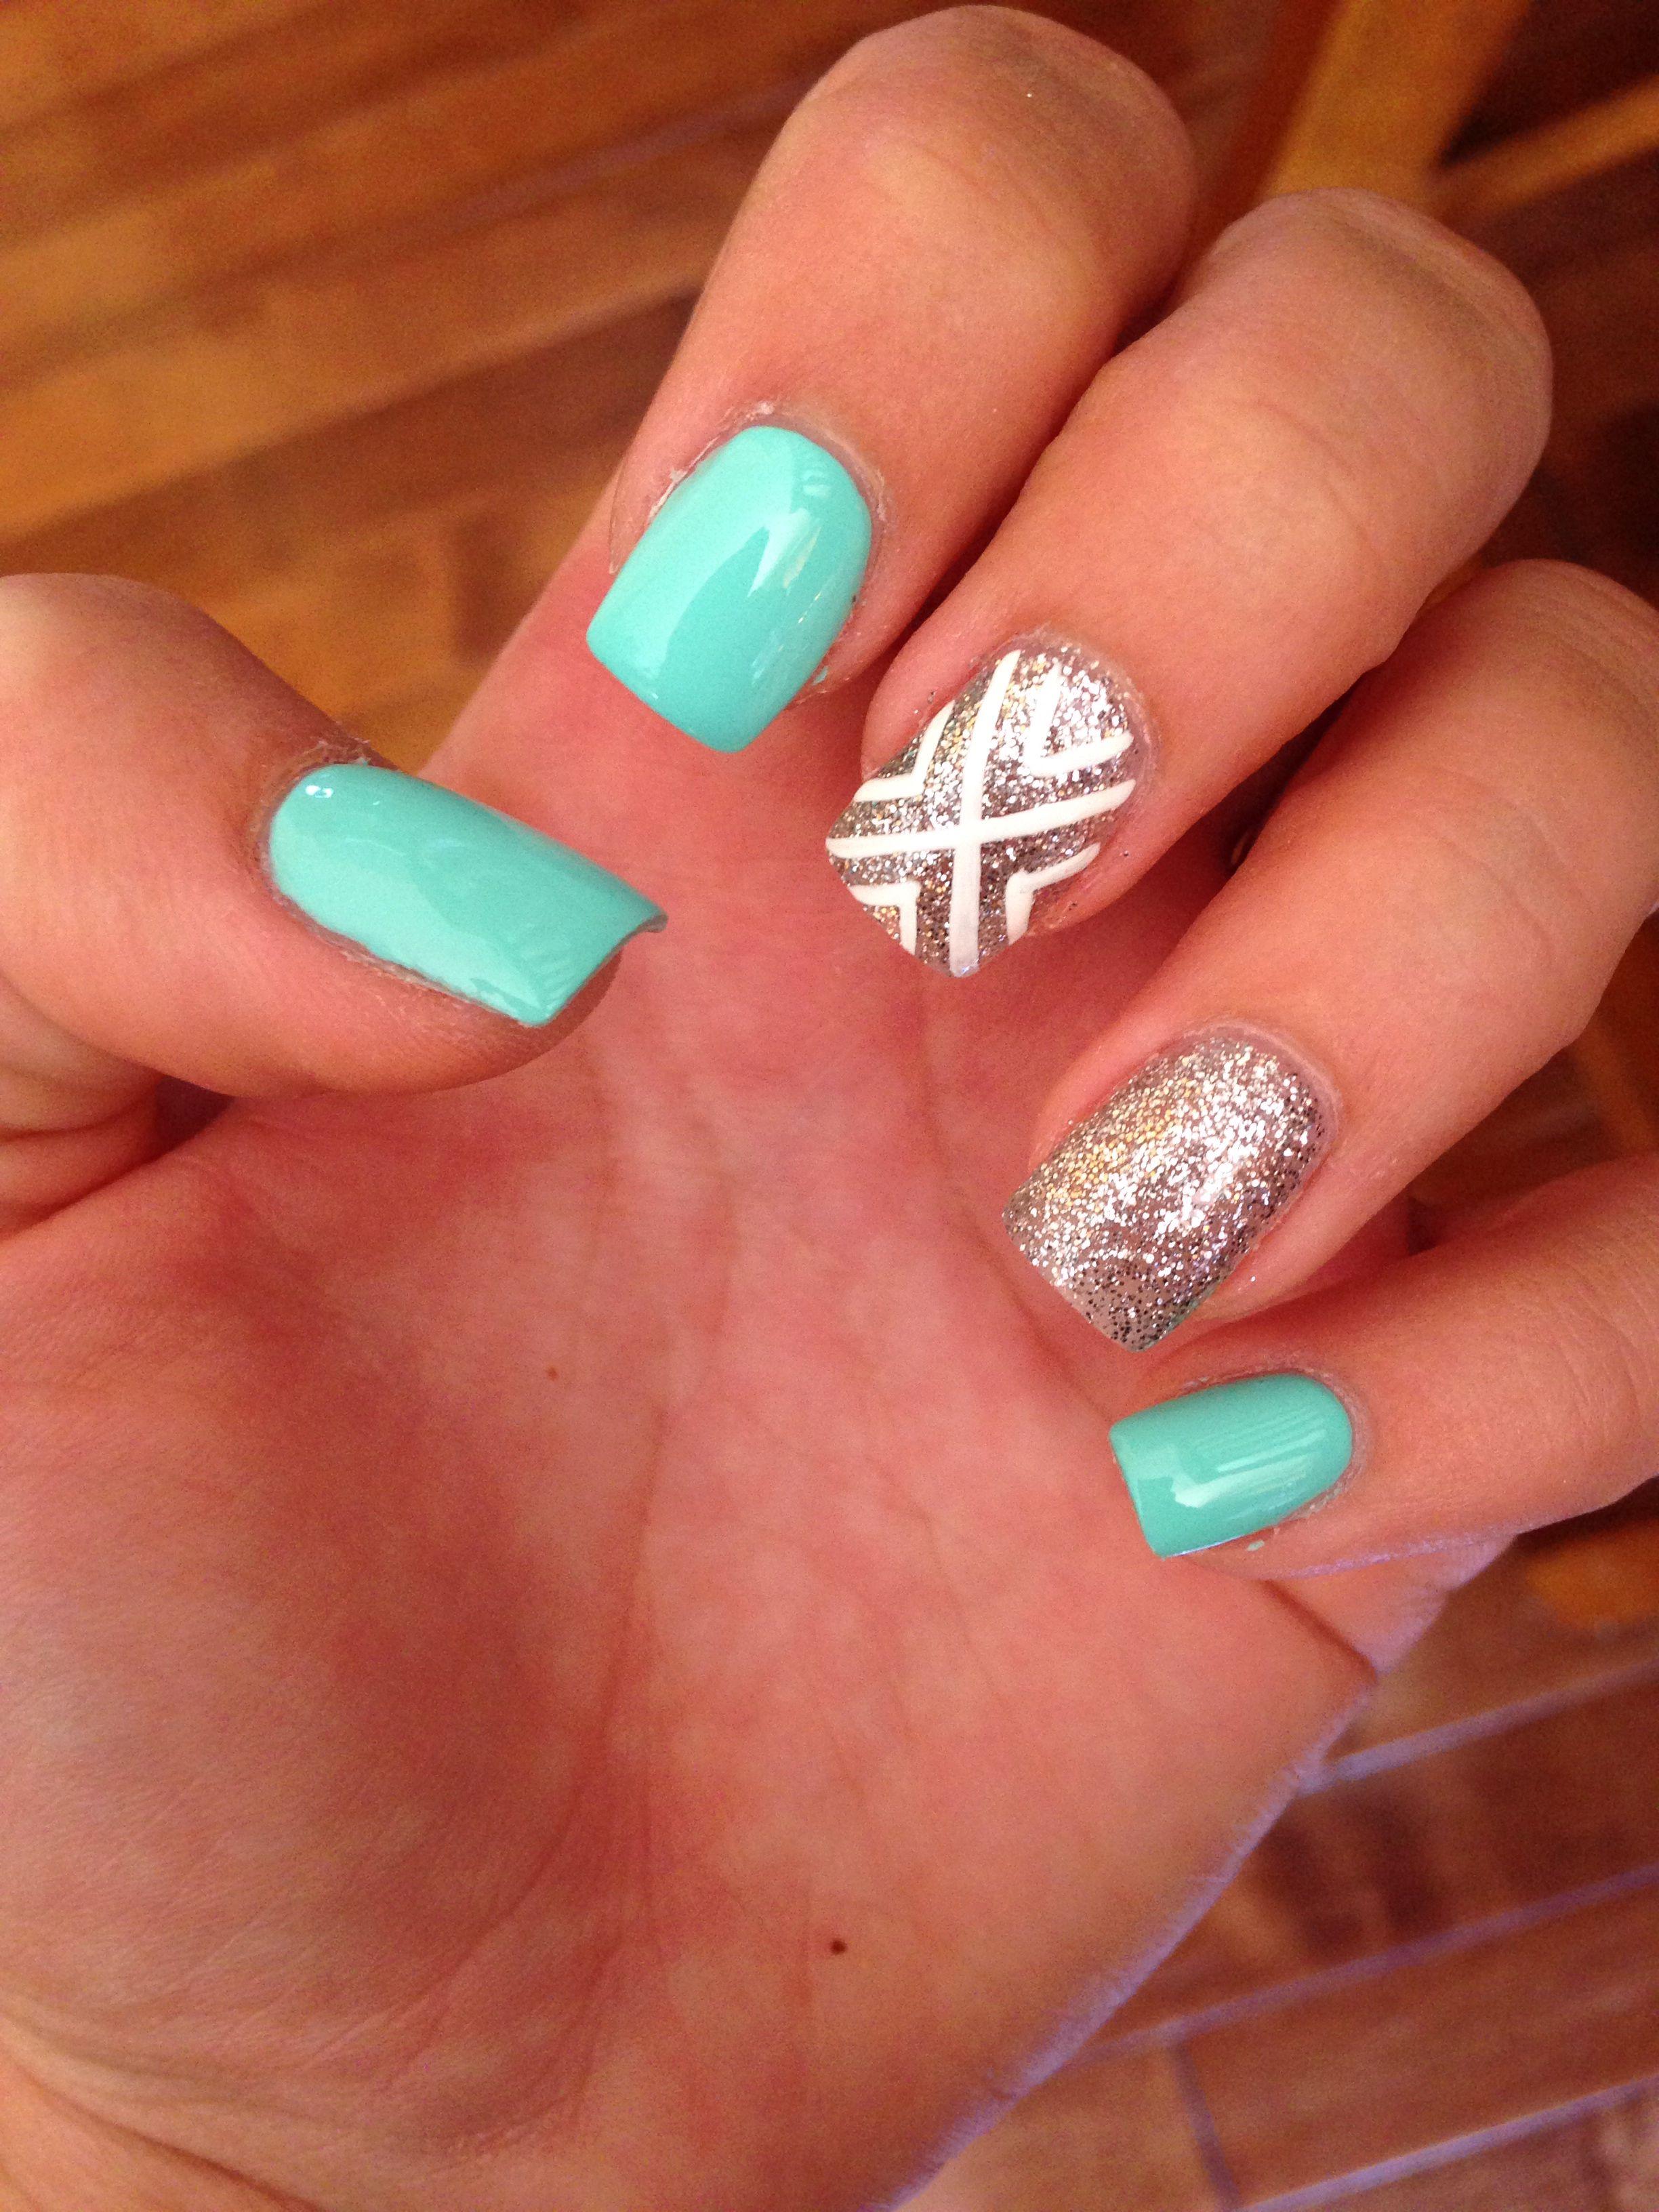 Summer Nails Teal And Sparkly Nails Teal Nails Summer